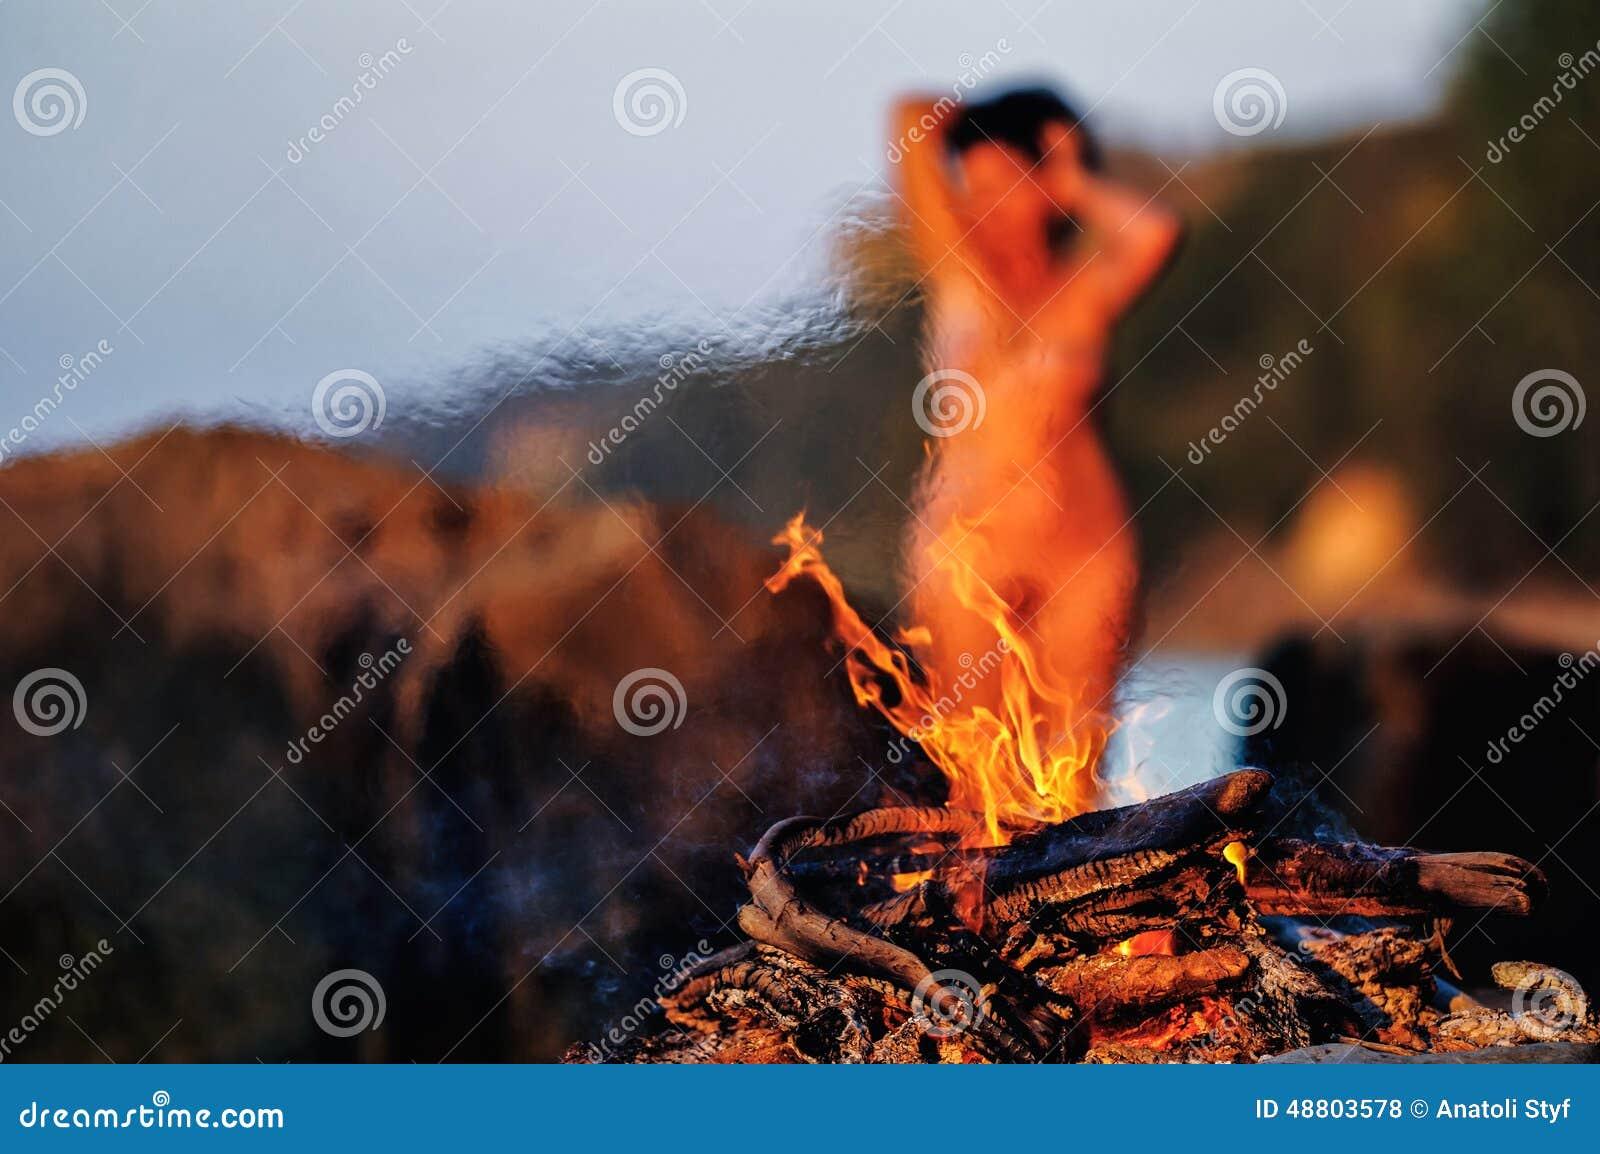 Campfire nude Nude Photos 37